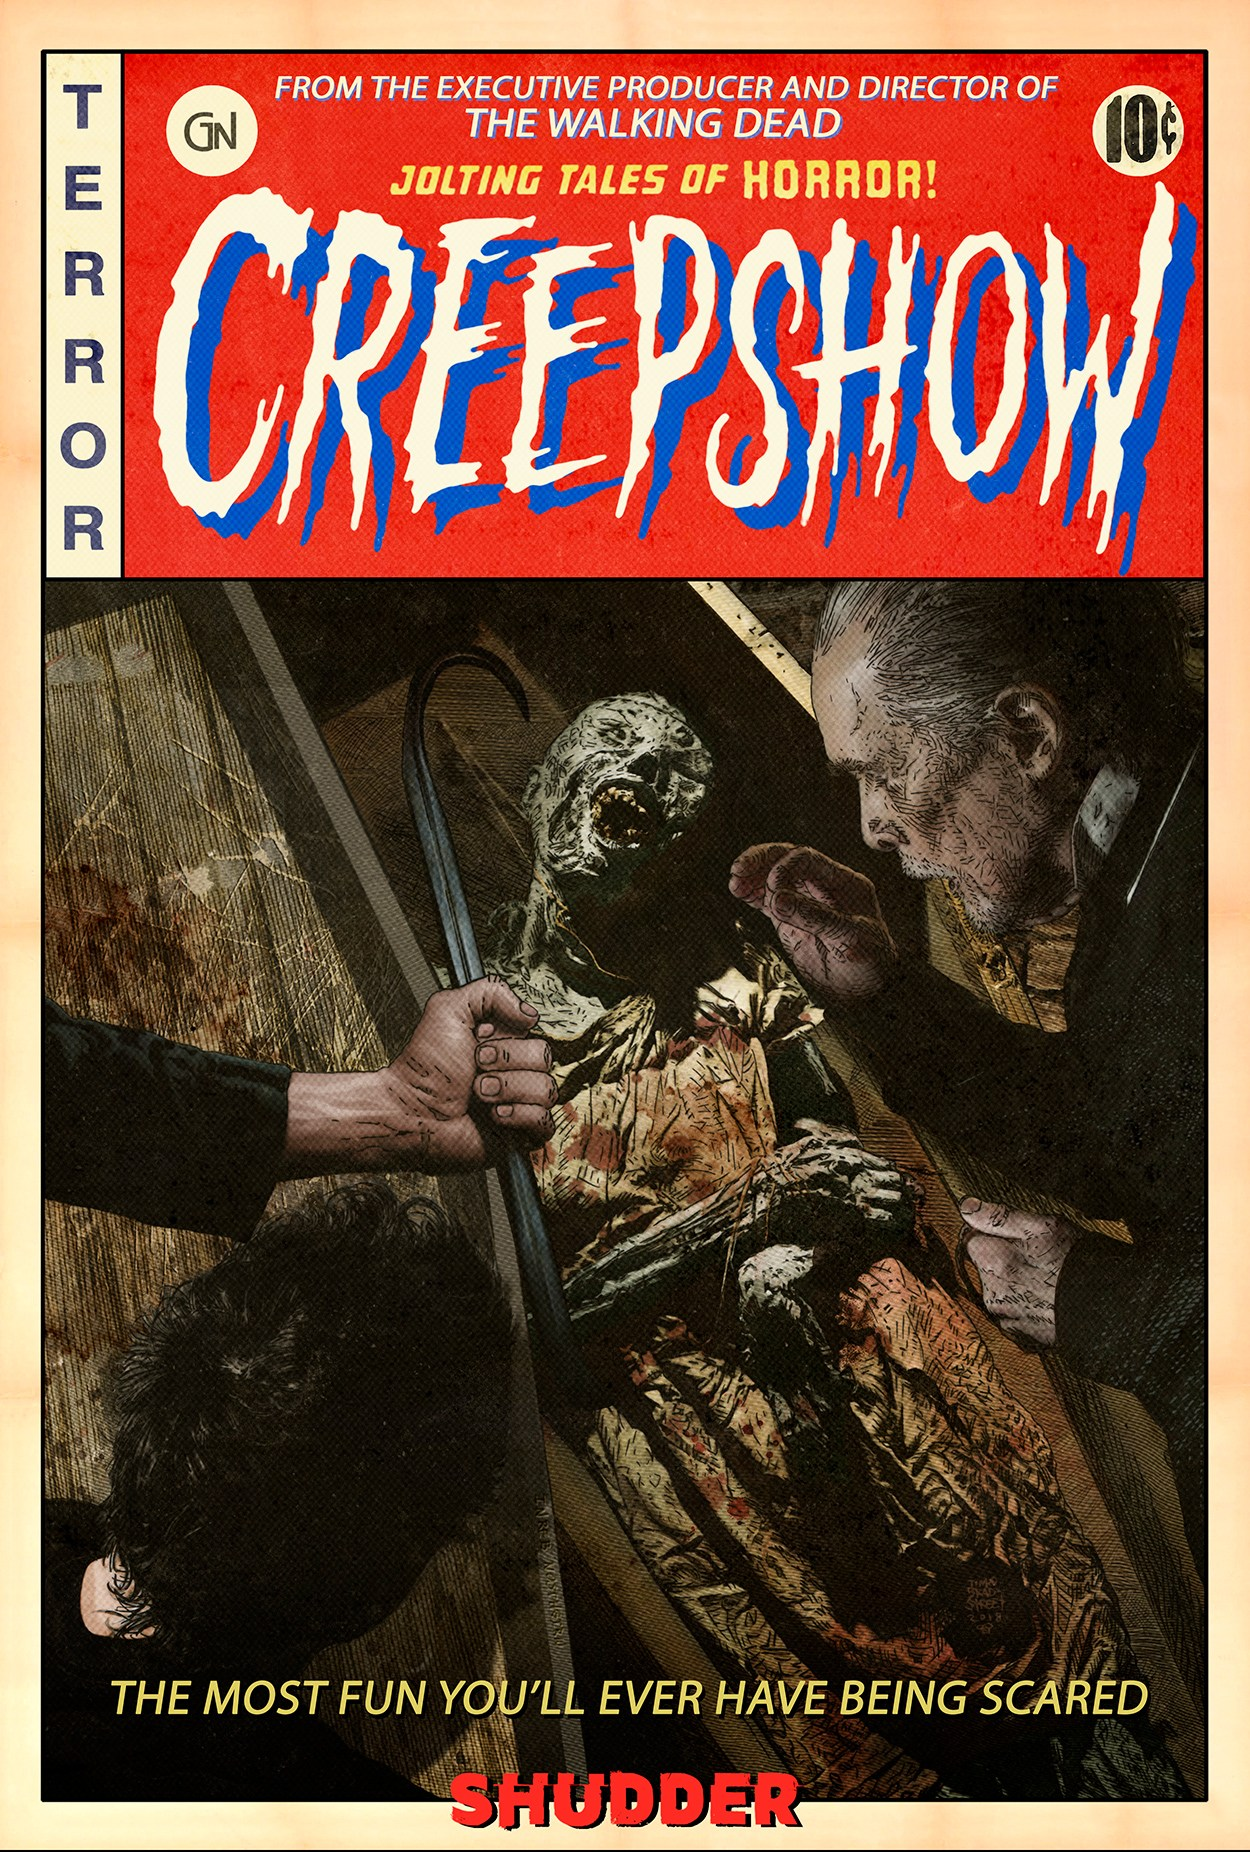 Creepshow shudder affiche